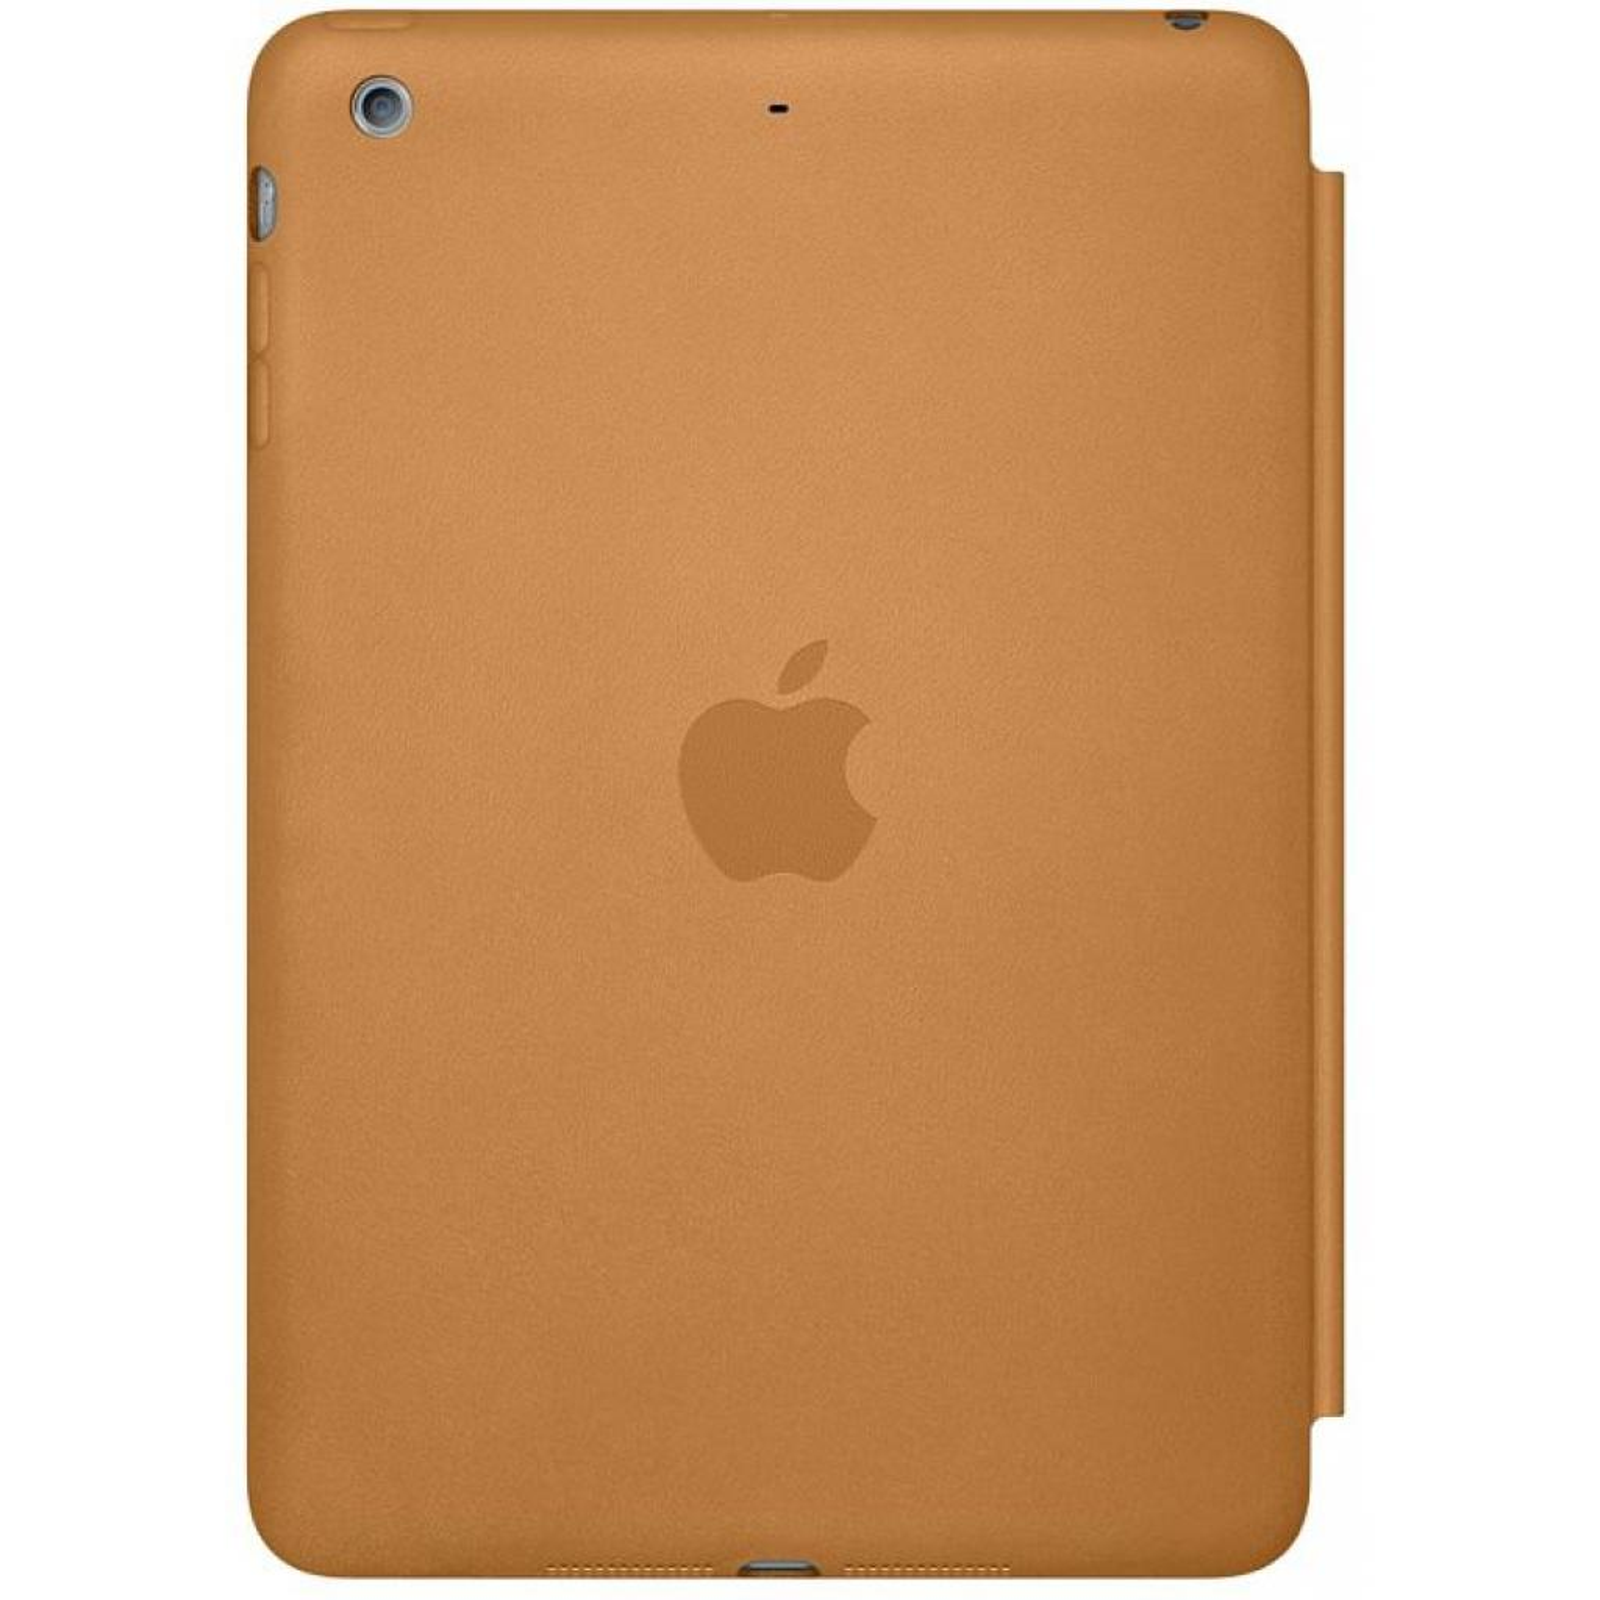 Чехол для планшета Apple Smart Case для iPad mini /brown (ME706ZM/A) изображение 2